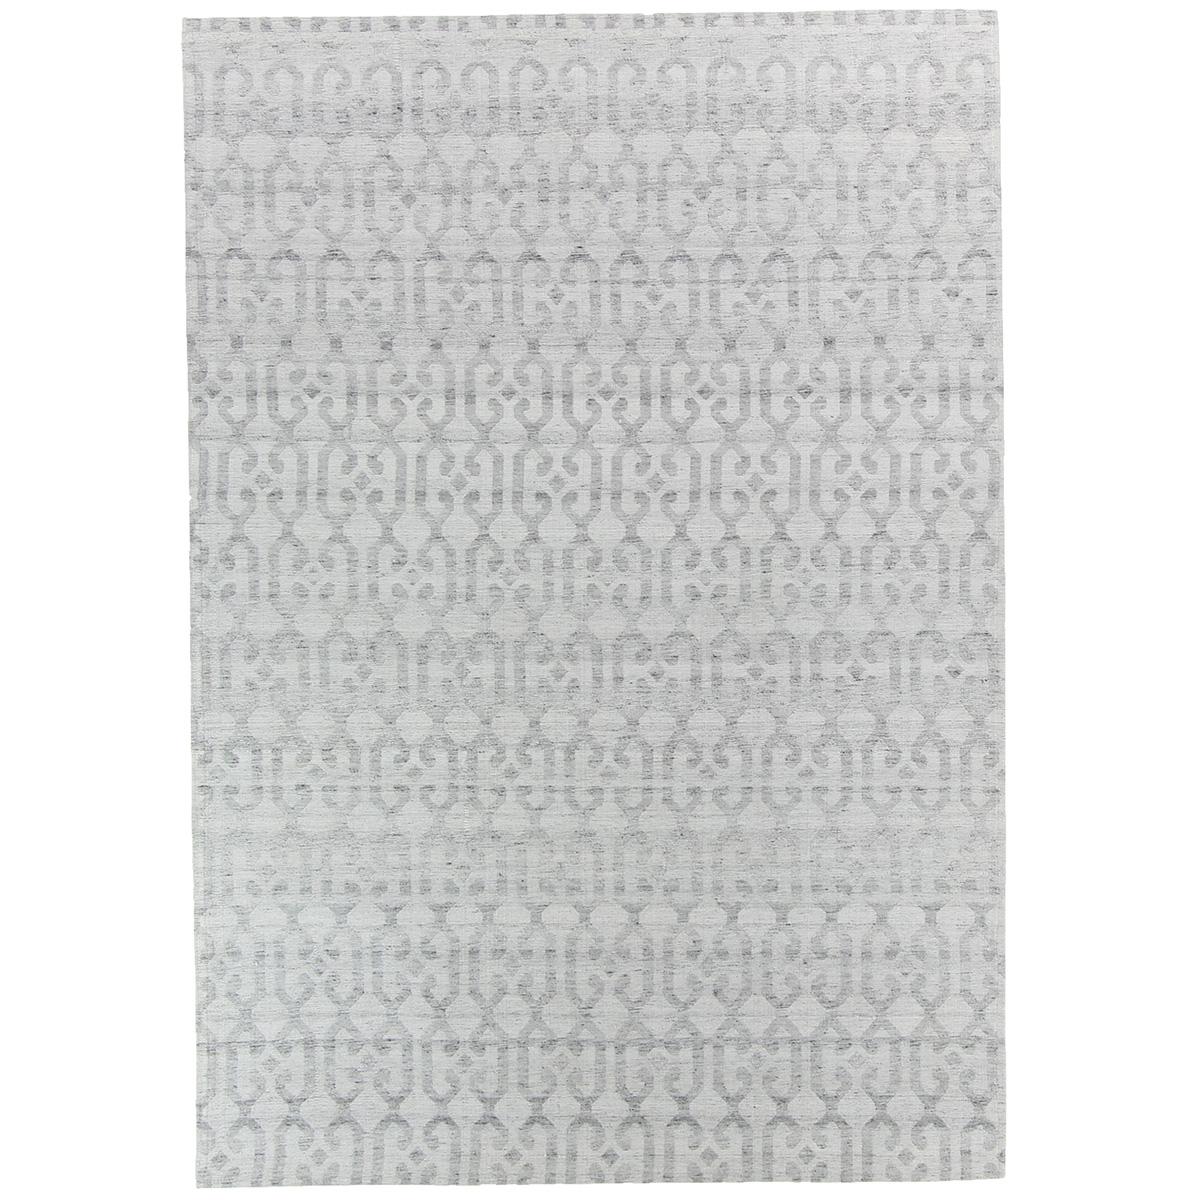 Vloerkleed Brinker Jera Silver | 200 x 290 cm